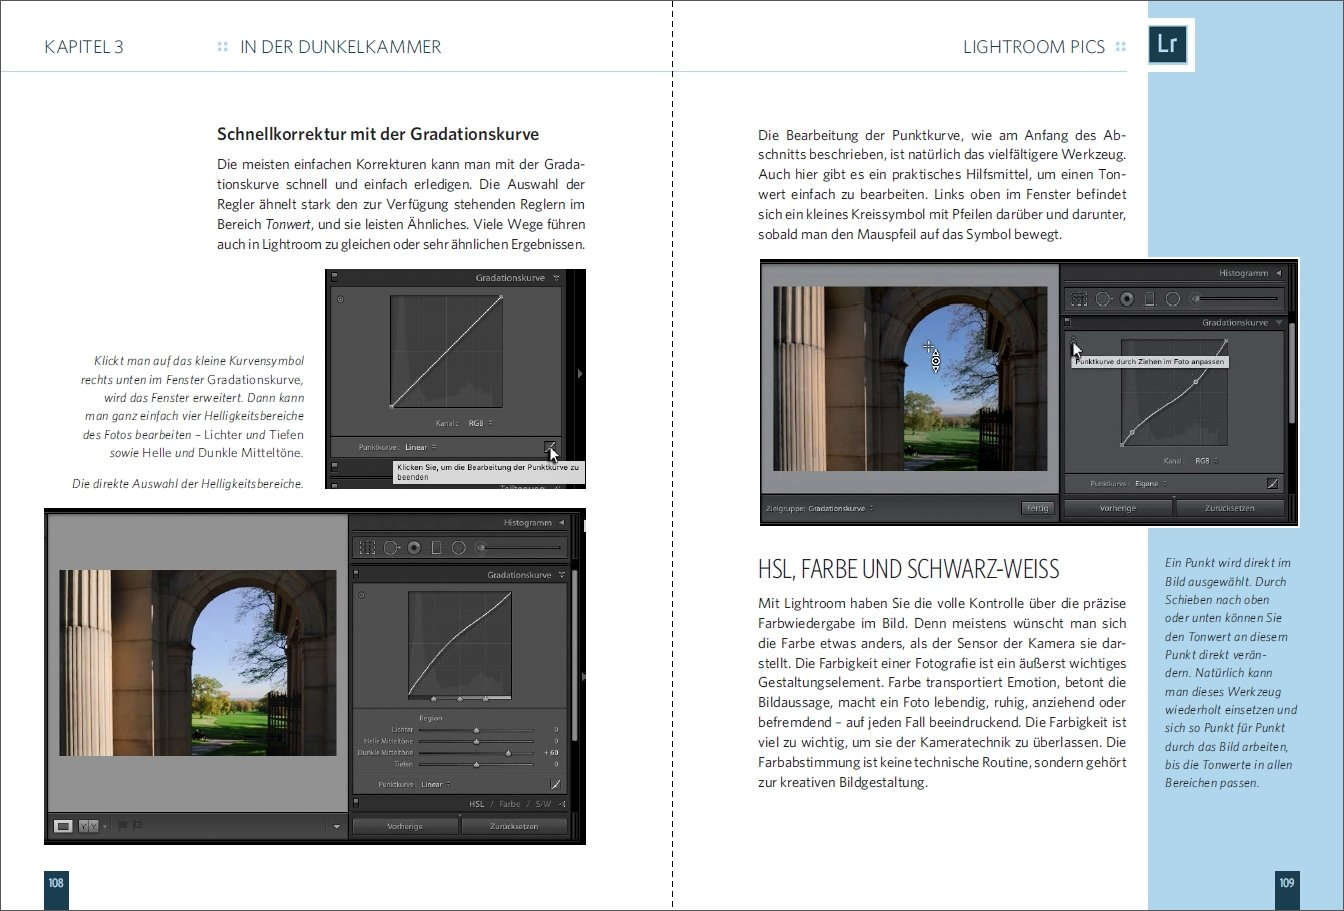 Lightroom Pics: Perfekte Bilder mit Adobe® Lightroom: Amazon.de ...